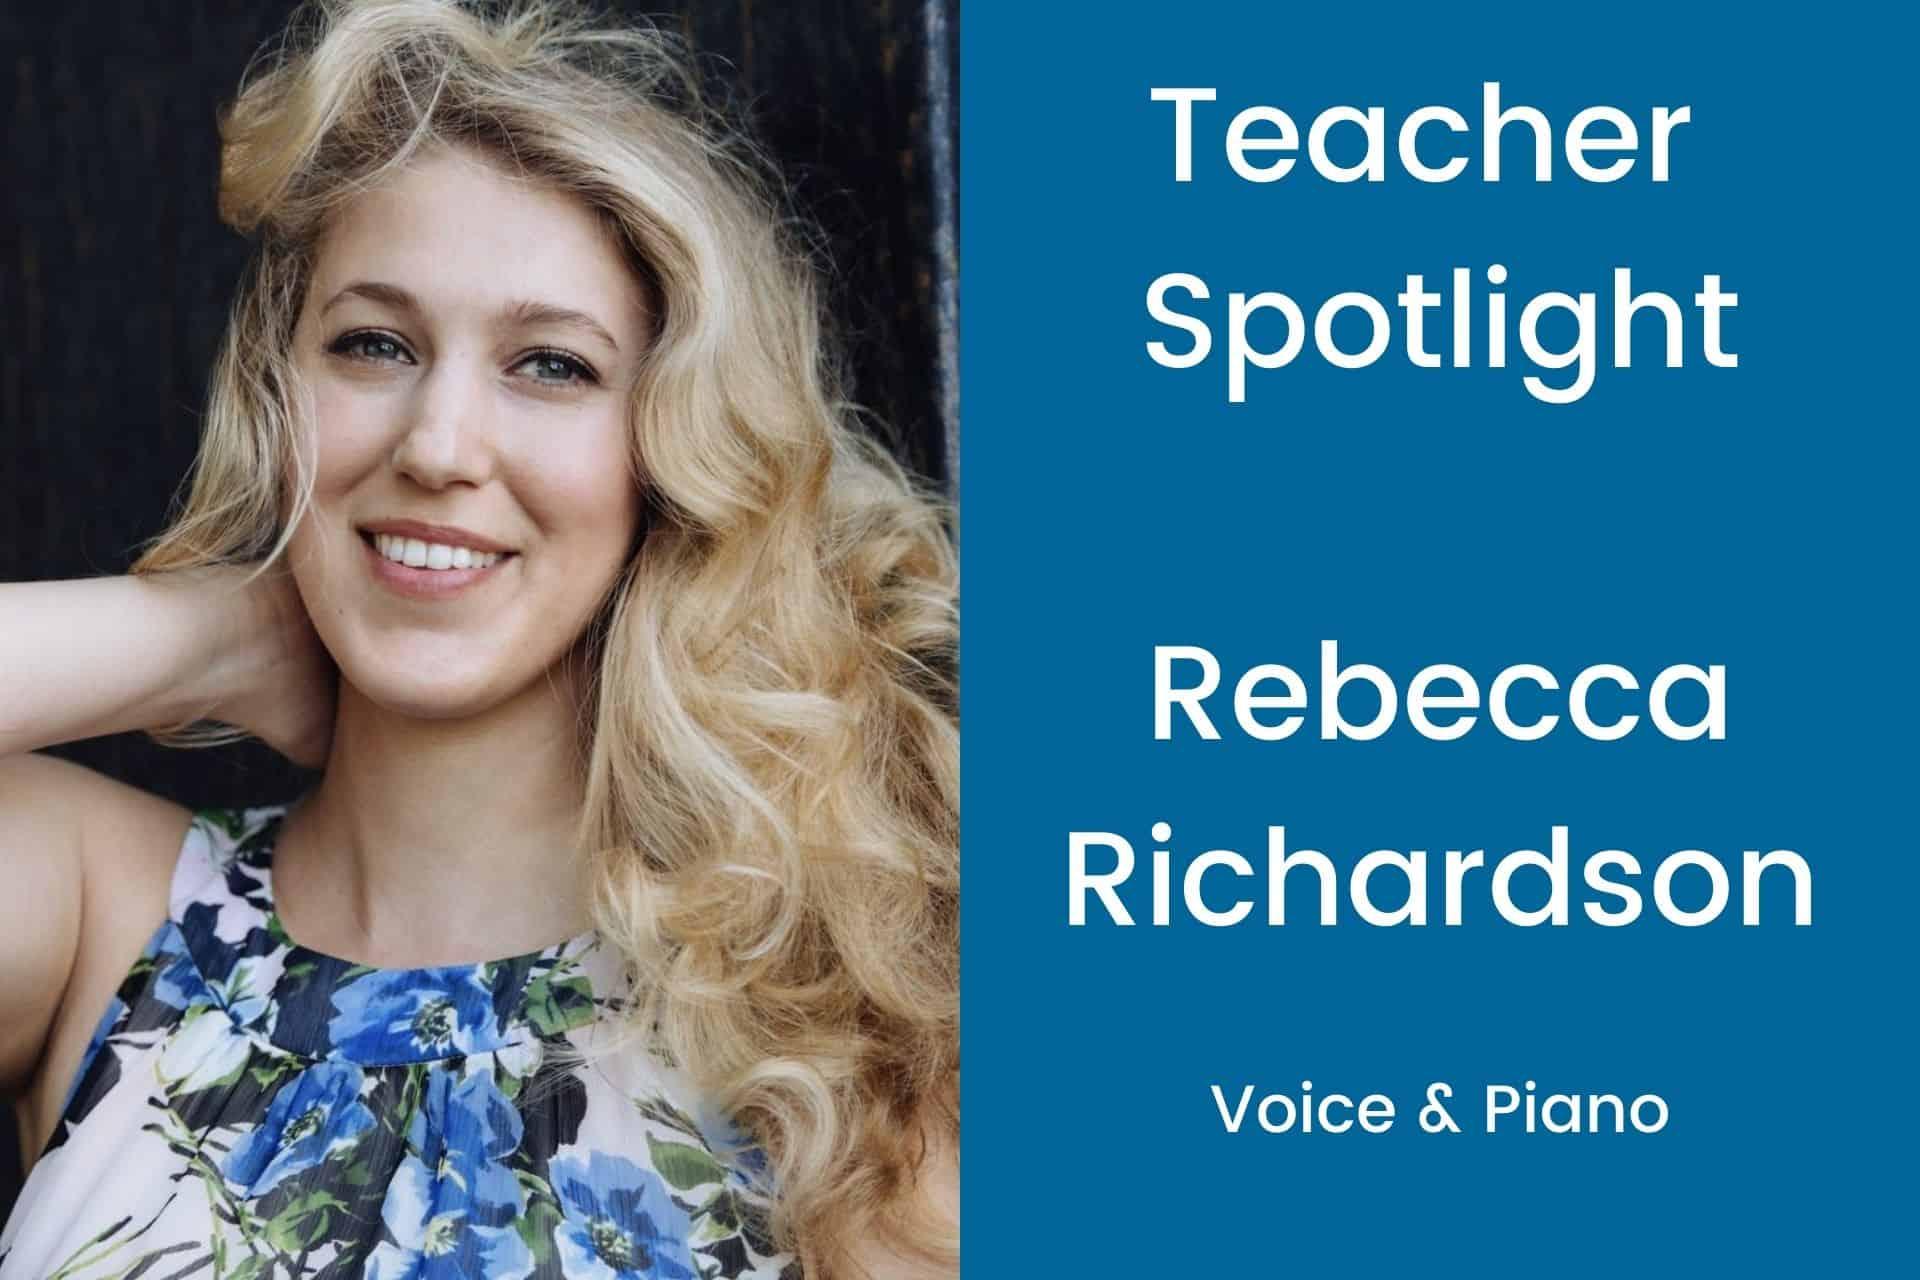 Teacher Spotlight Rebecca Richardson